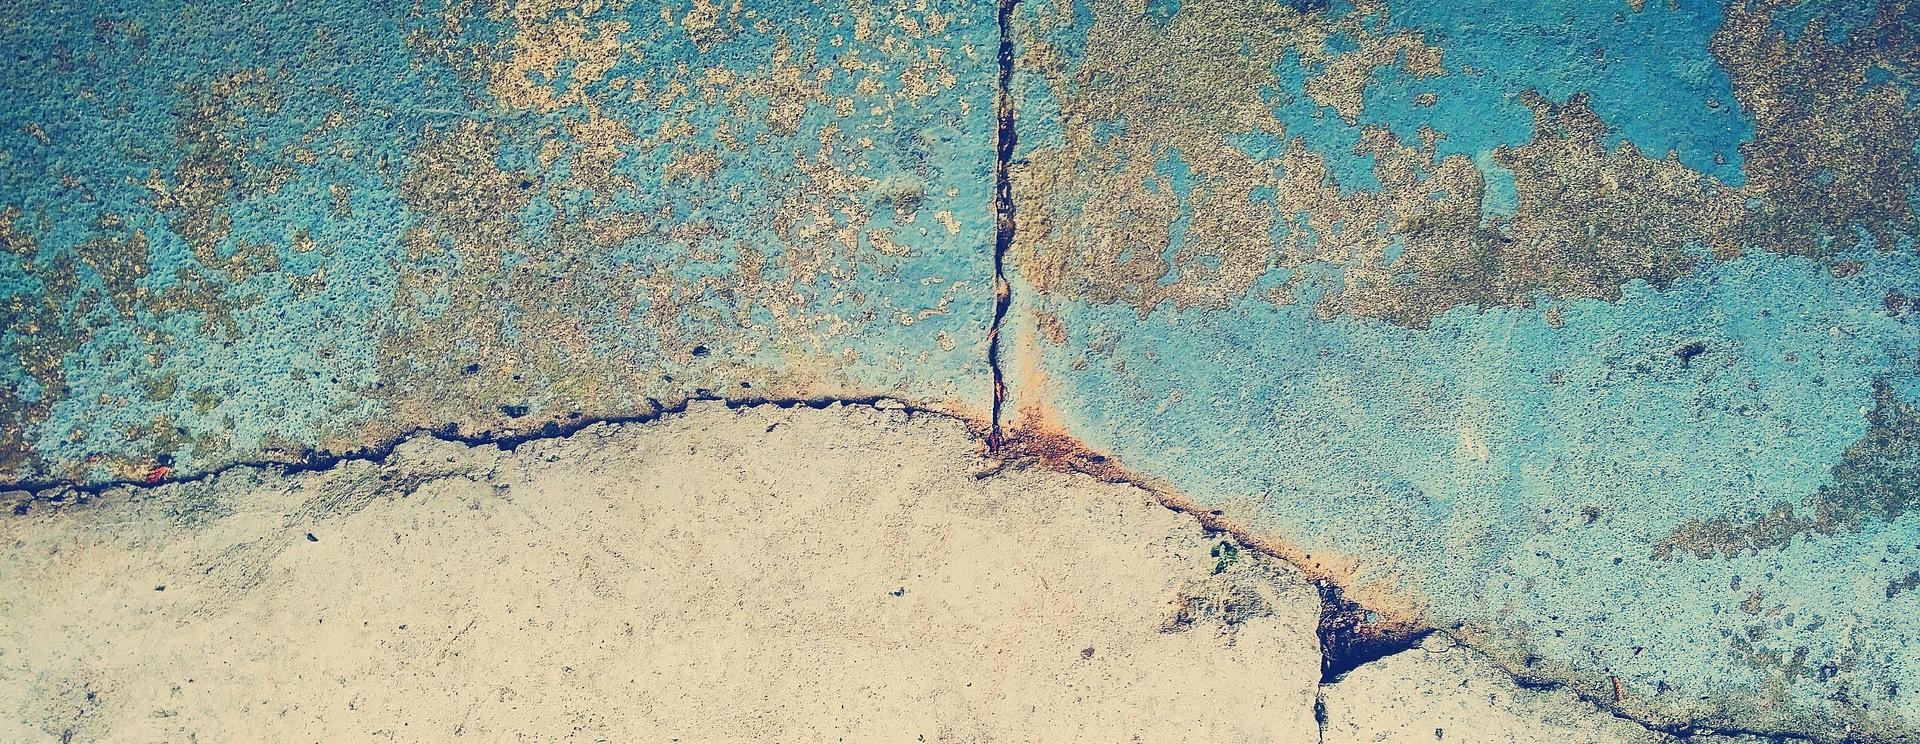 Wasserschadensanierung Wasserschaden Wasserschadenbeseitigung Bautrocknung Duregger Bautrockner mieten Trocknen Wasserschadenbekämpfung Hochwasser Schaden Entfeuchter Riss